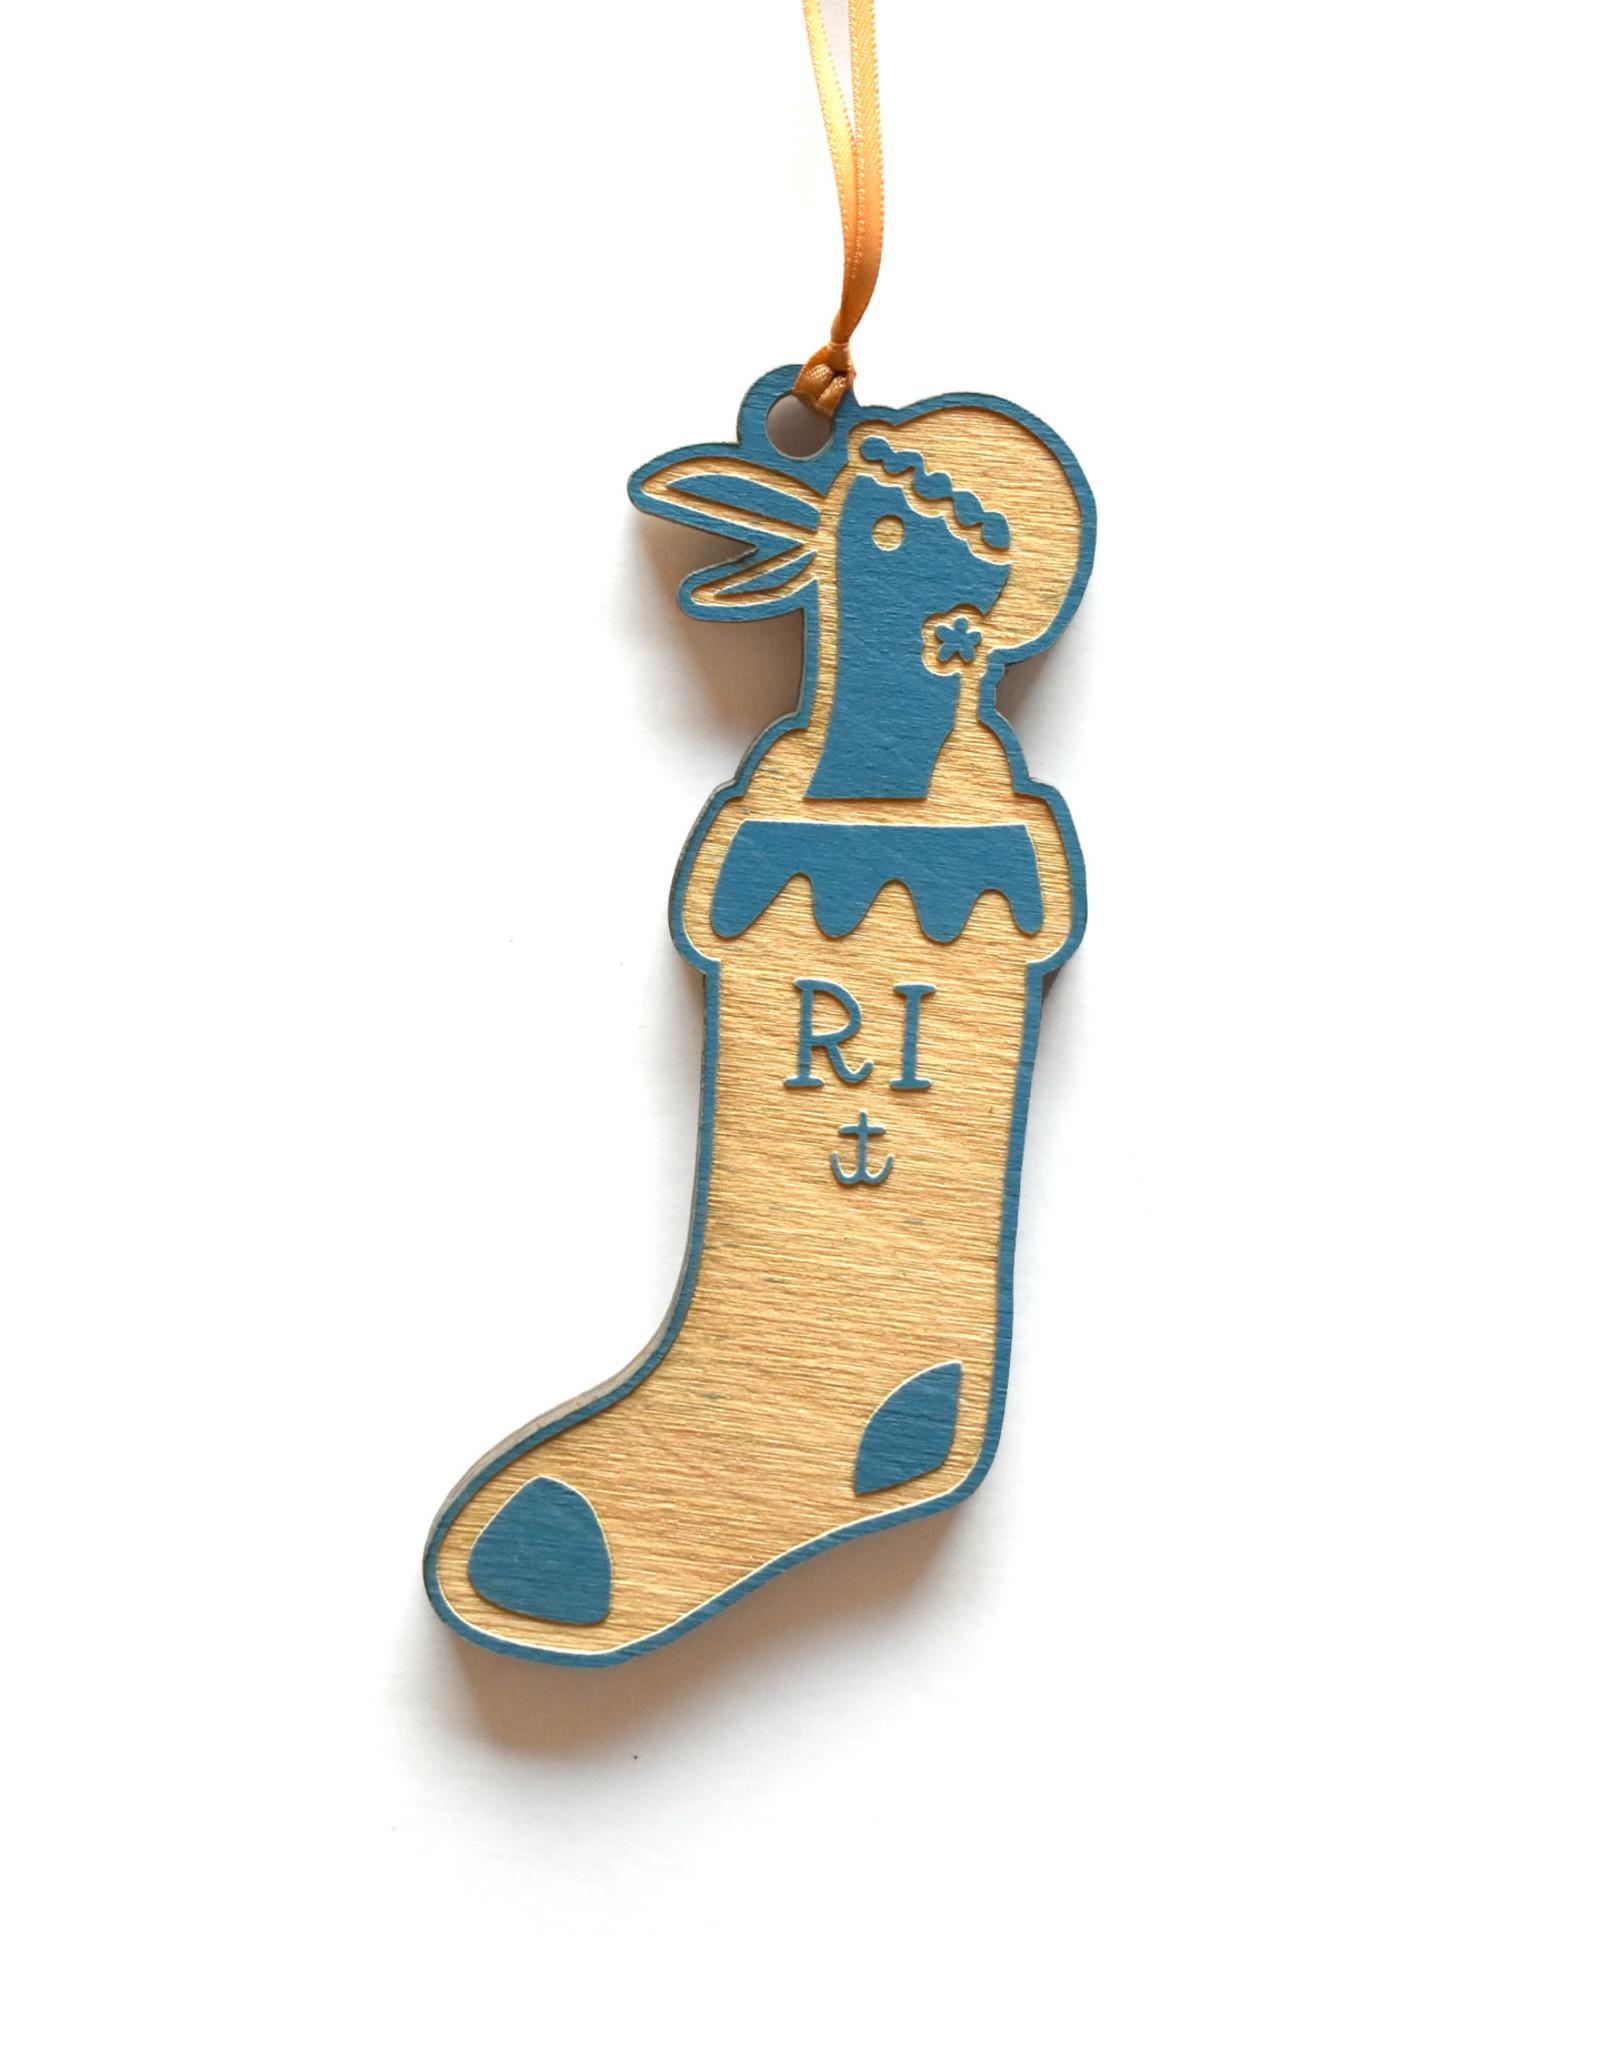 RI Seagull Stocking Ornament